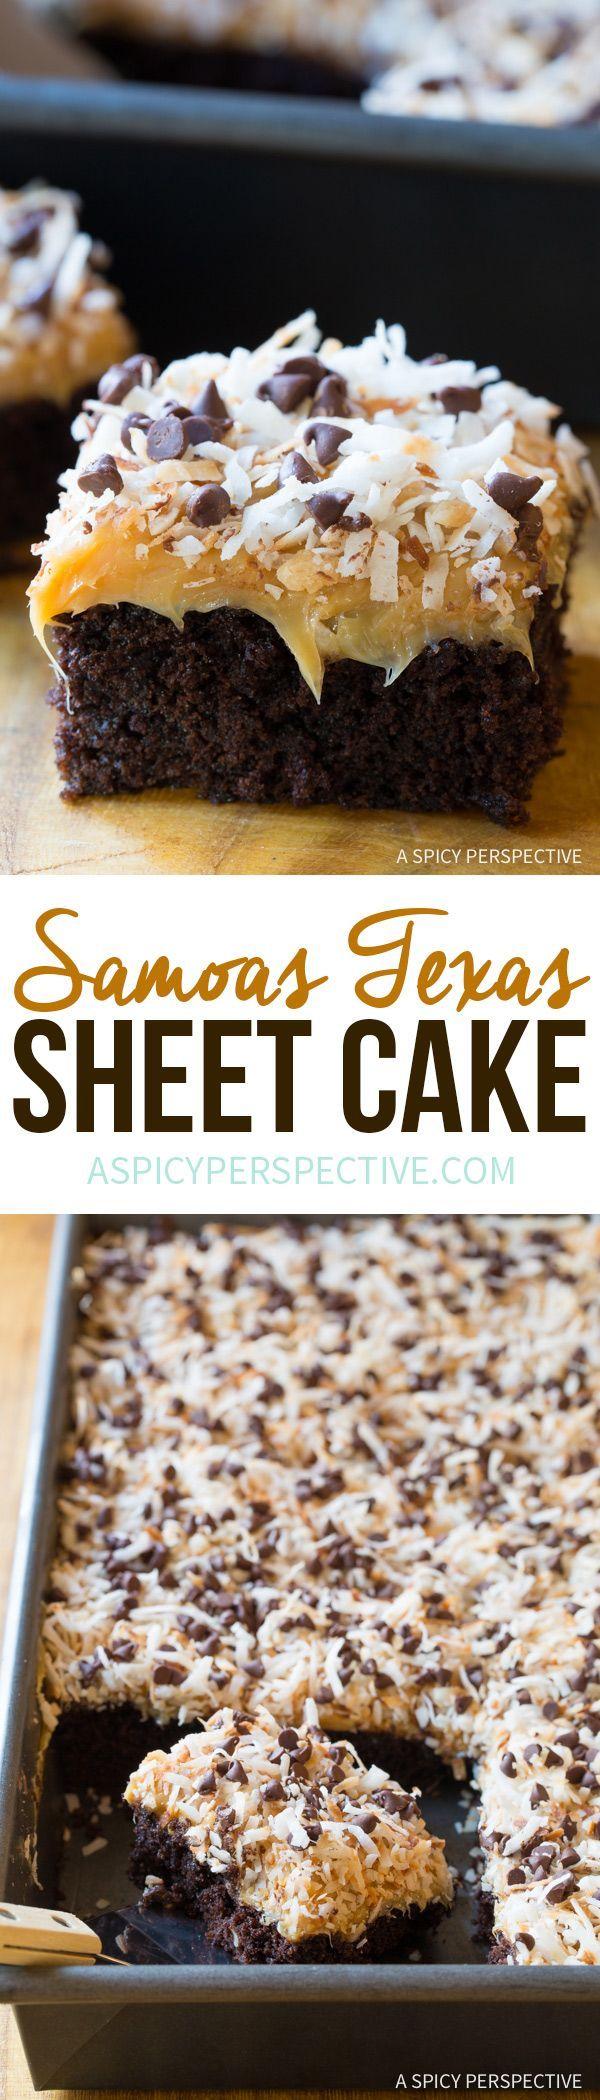 Samoas Texas Sheet Cake. YUM!!!